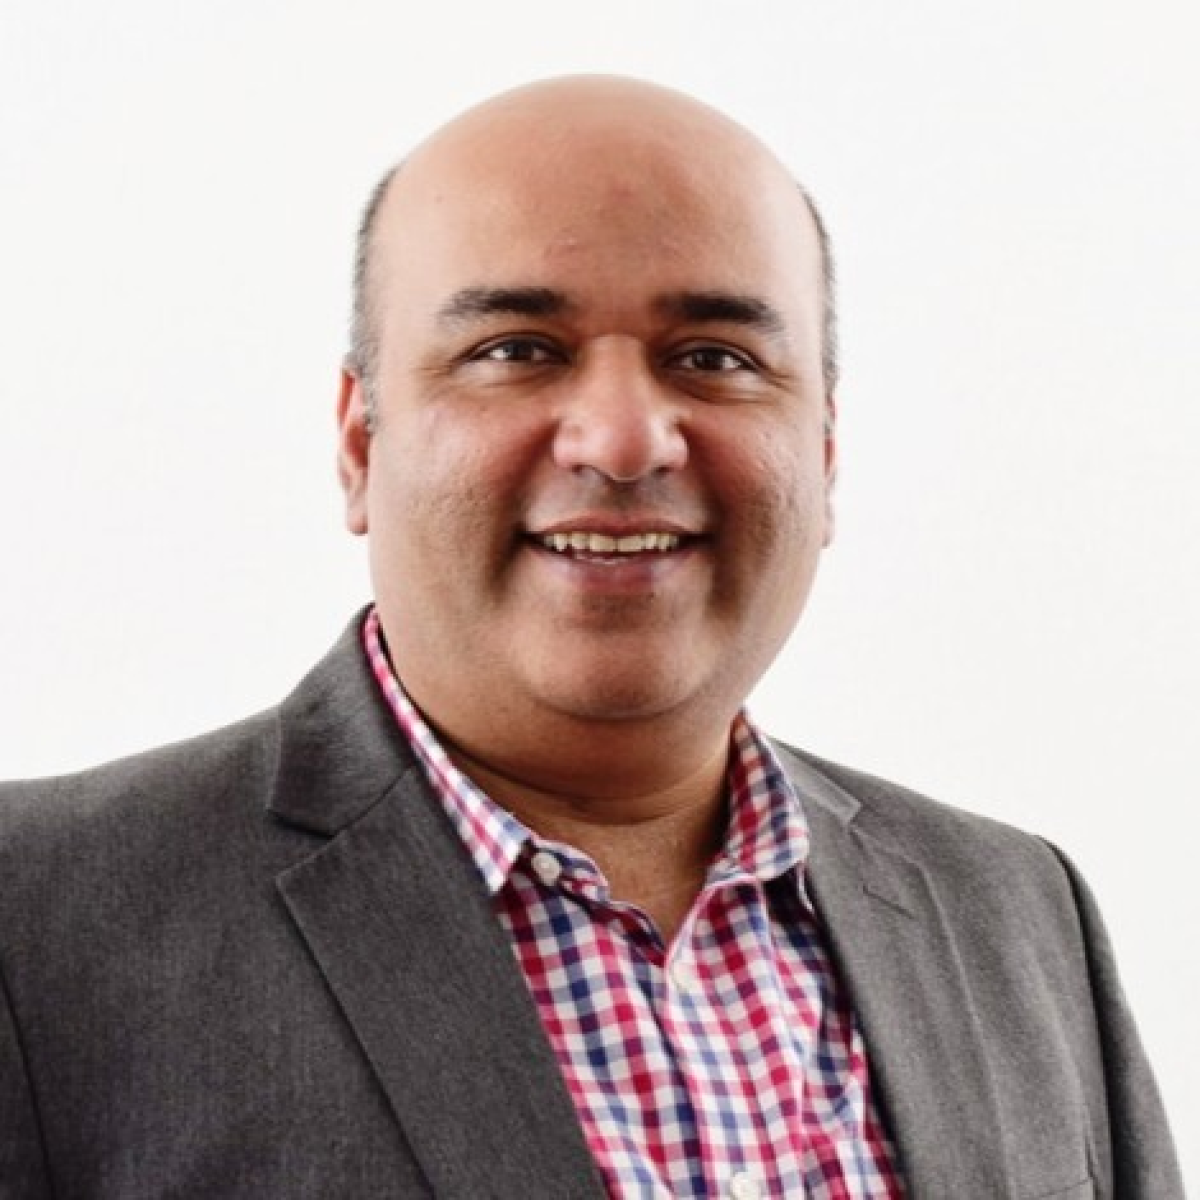 IIFL Securities appoints Manav Verma as CMO